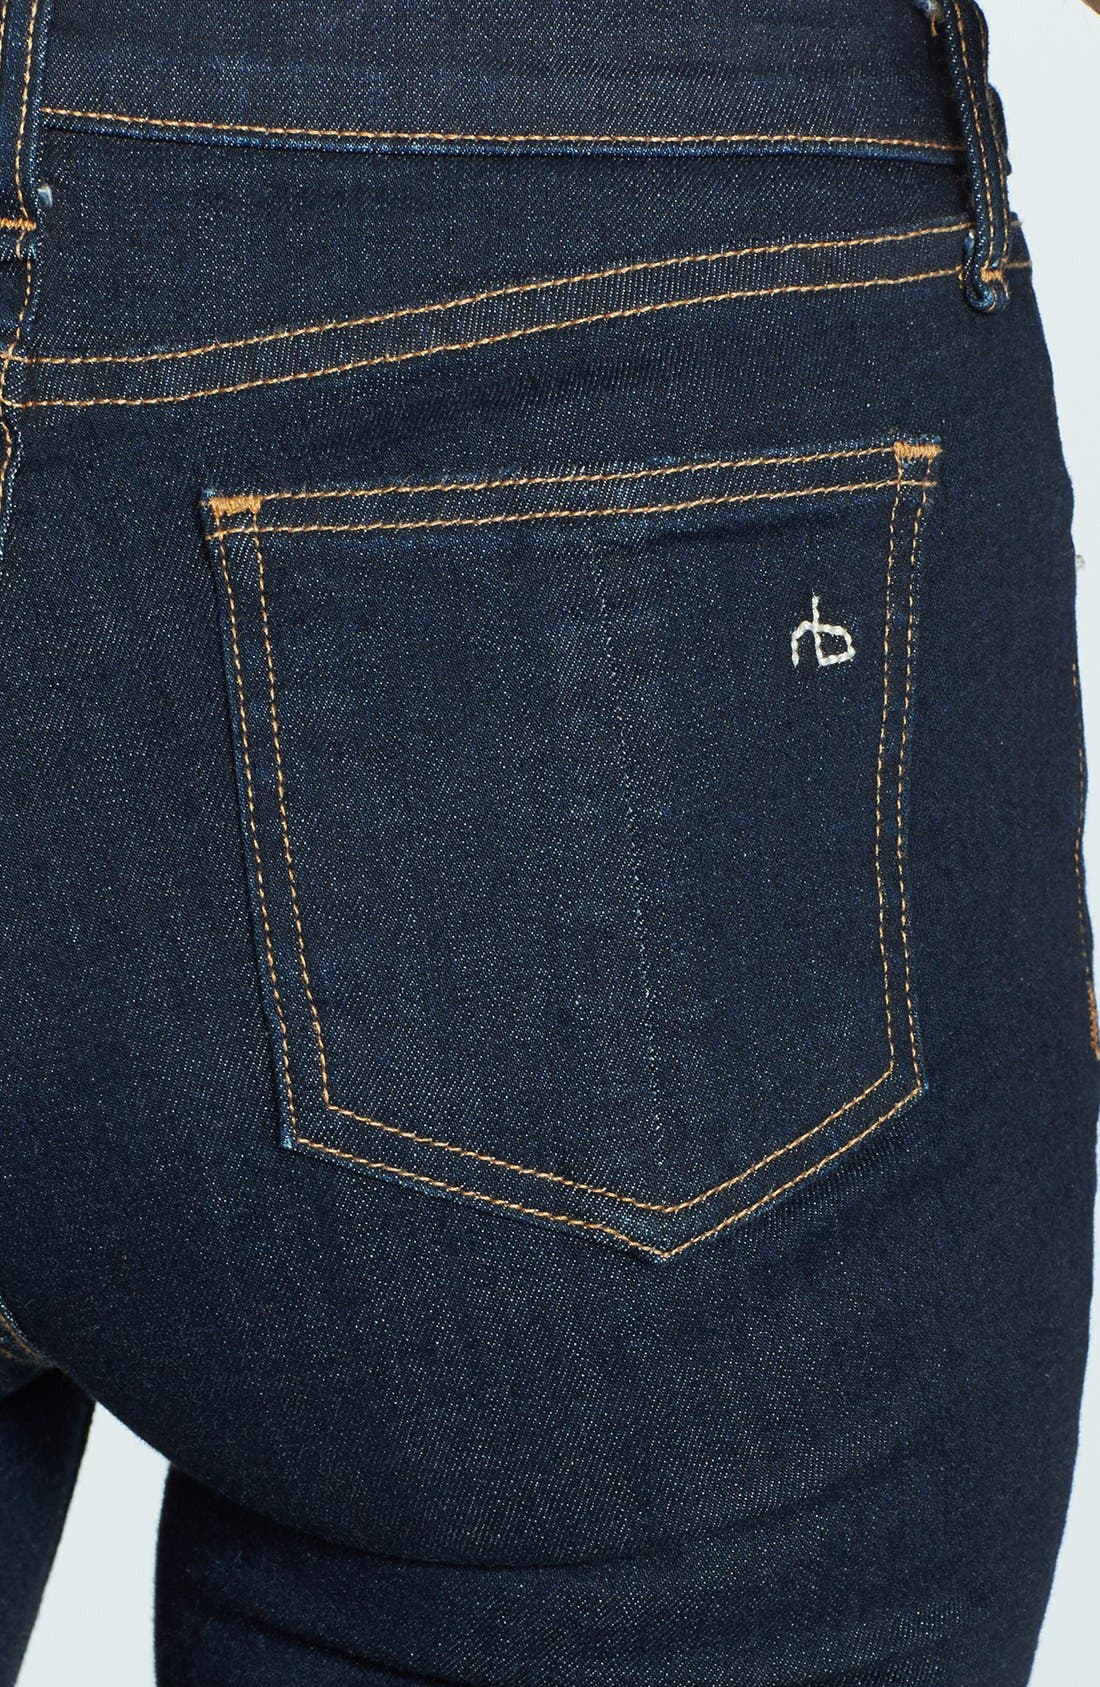 Alternate Image 3  - rag & bone/JEAN High Rise Skinny Jeans (Heritage)